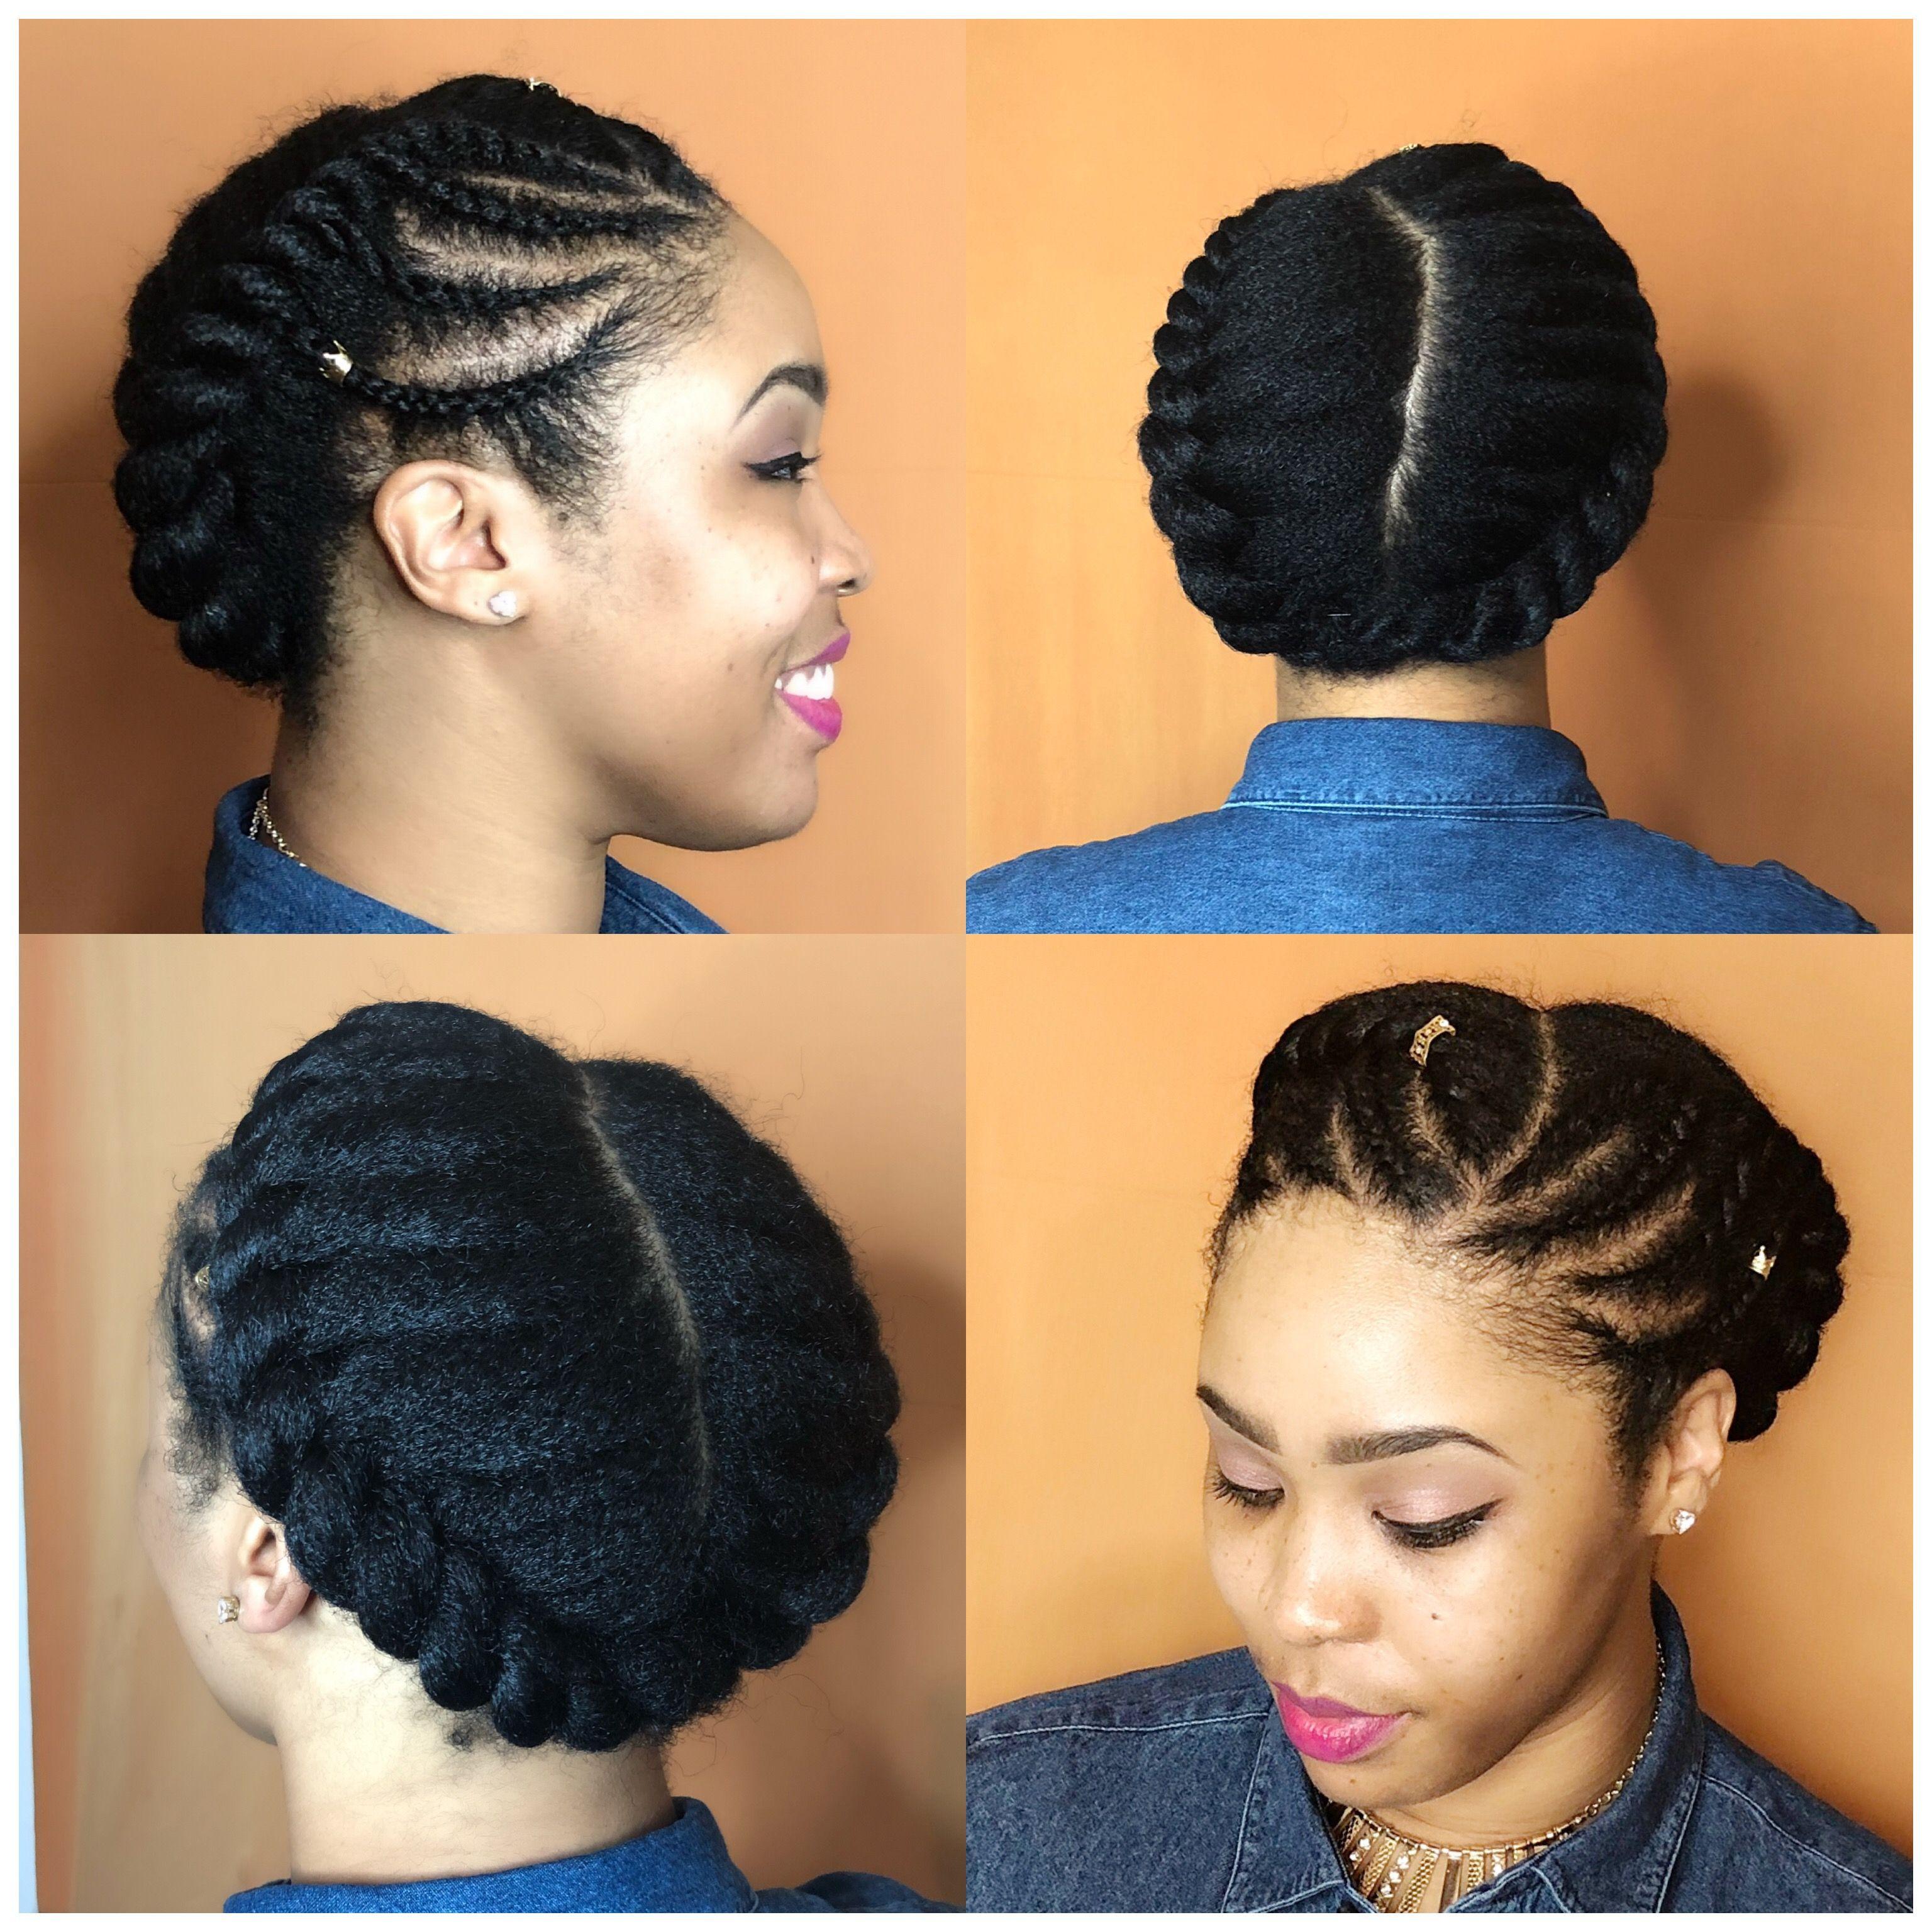 LoveLeyshair flat twist  braids c hairstyles c protective